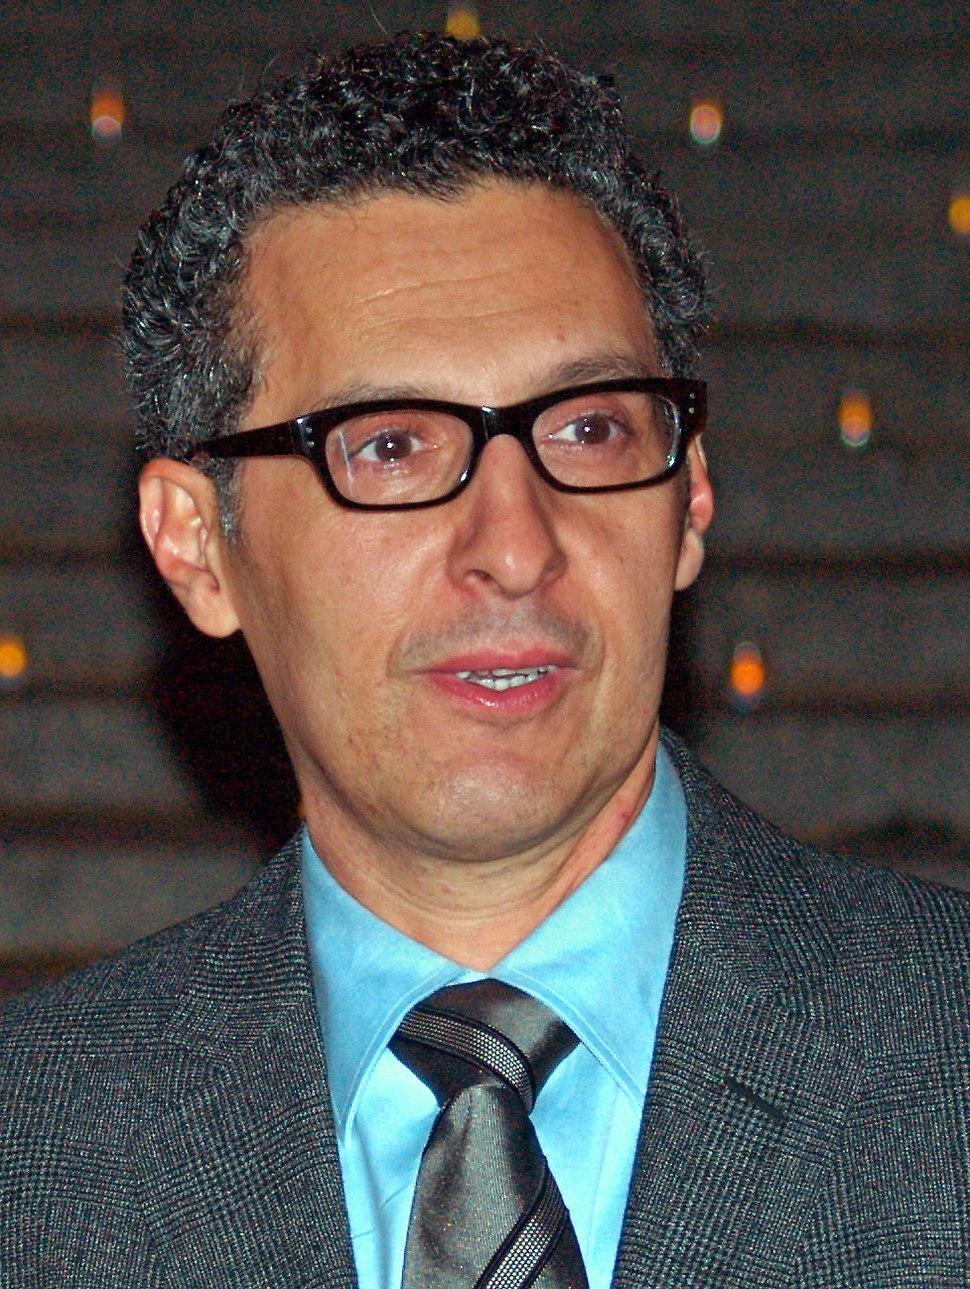 John Turturro at the 2009 Tribeca Film Festival